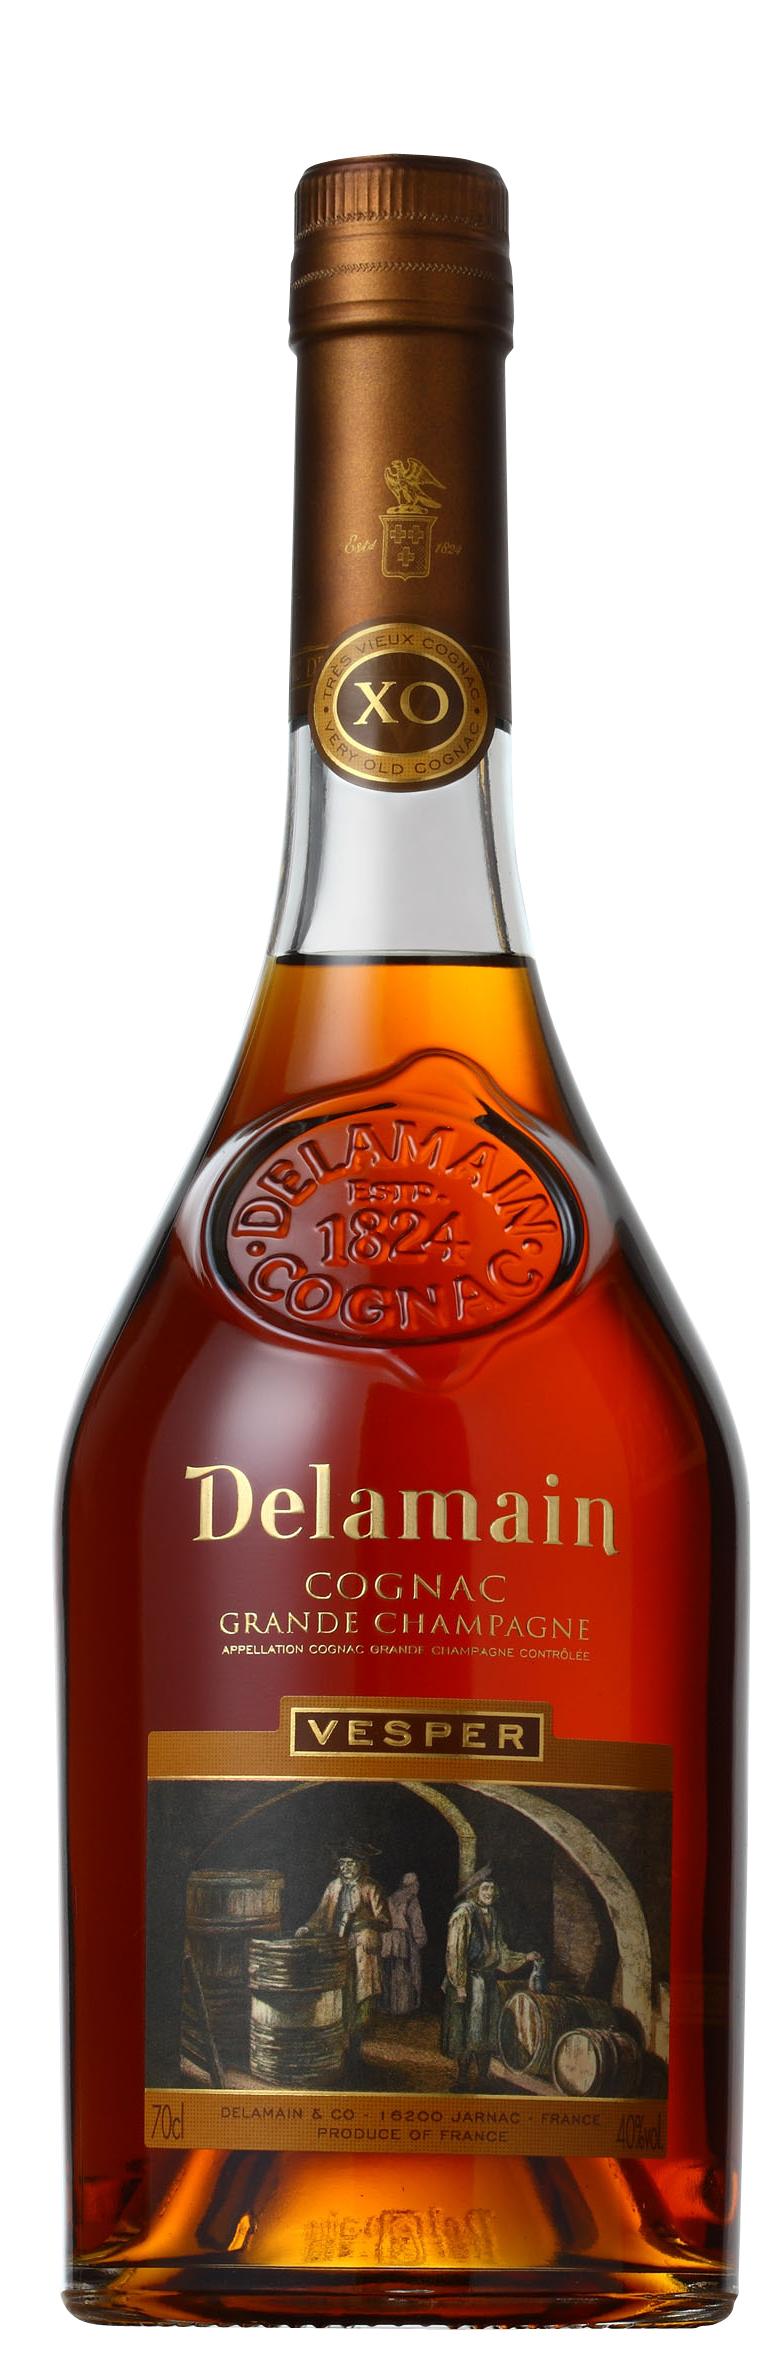 Delamain Vesper Grande Champagne Cognac Buy Online And